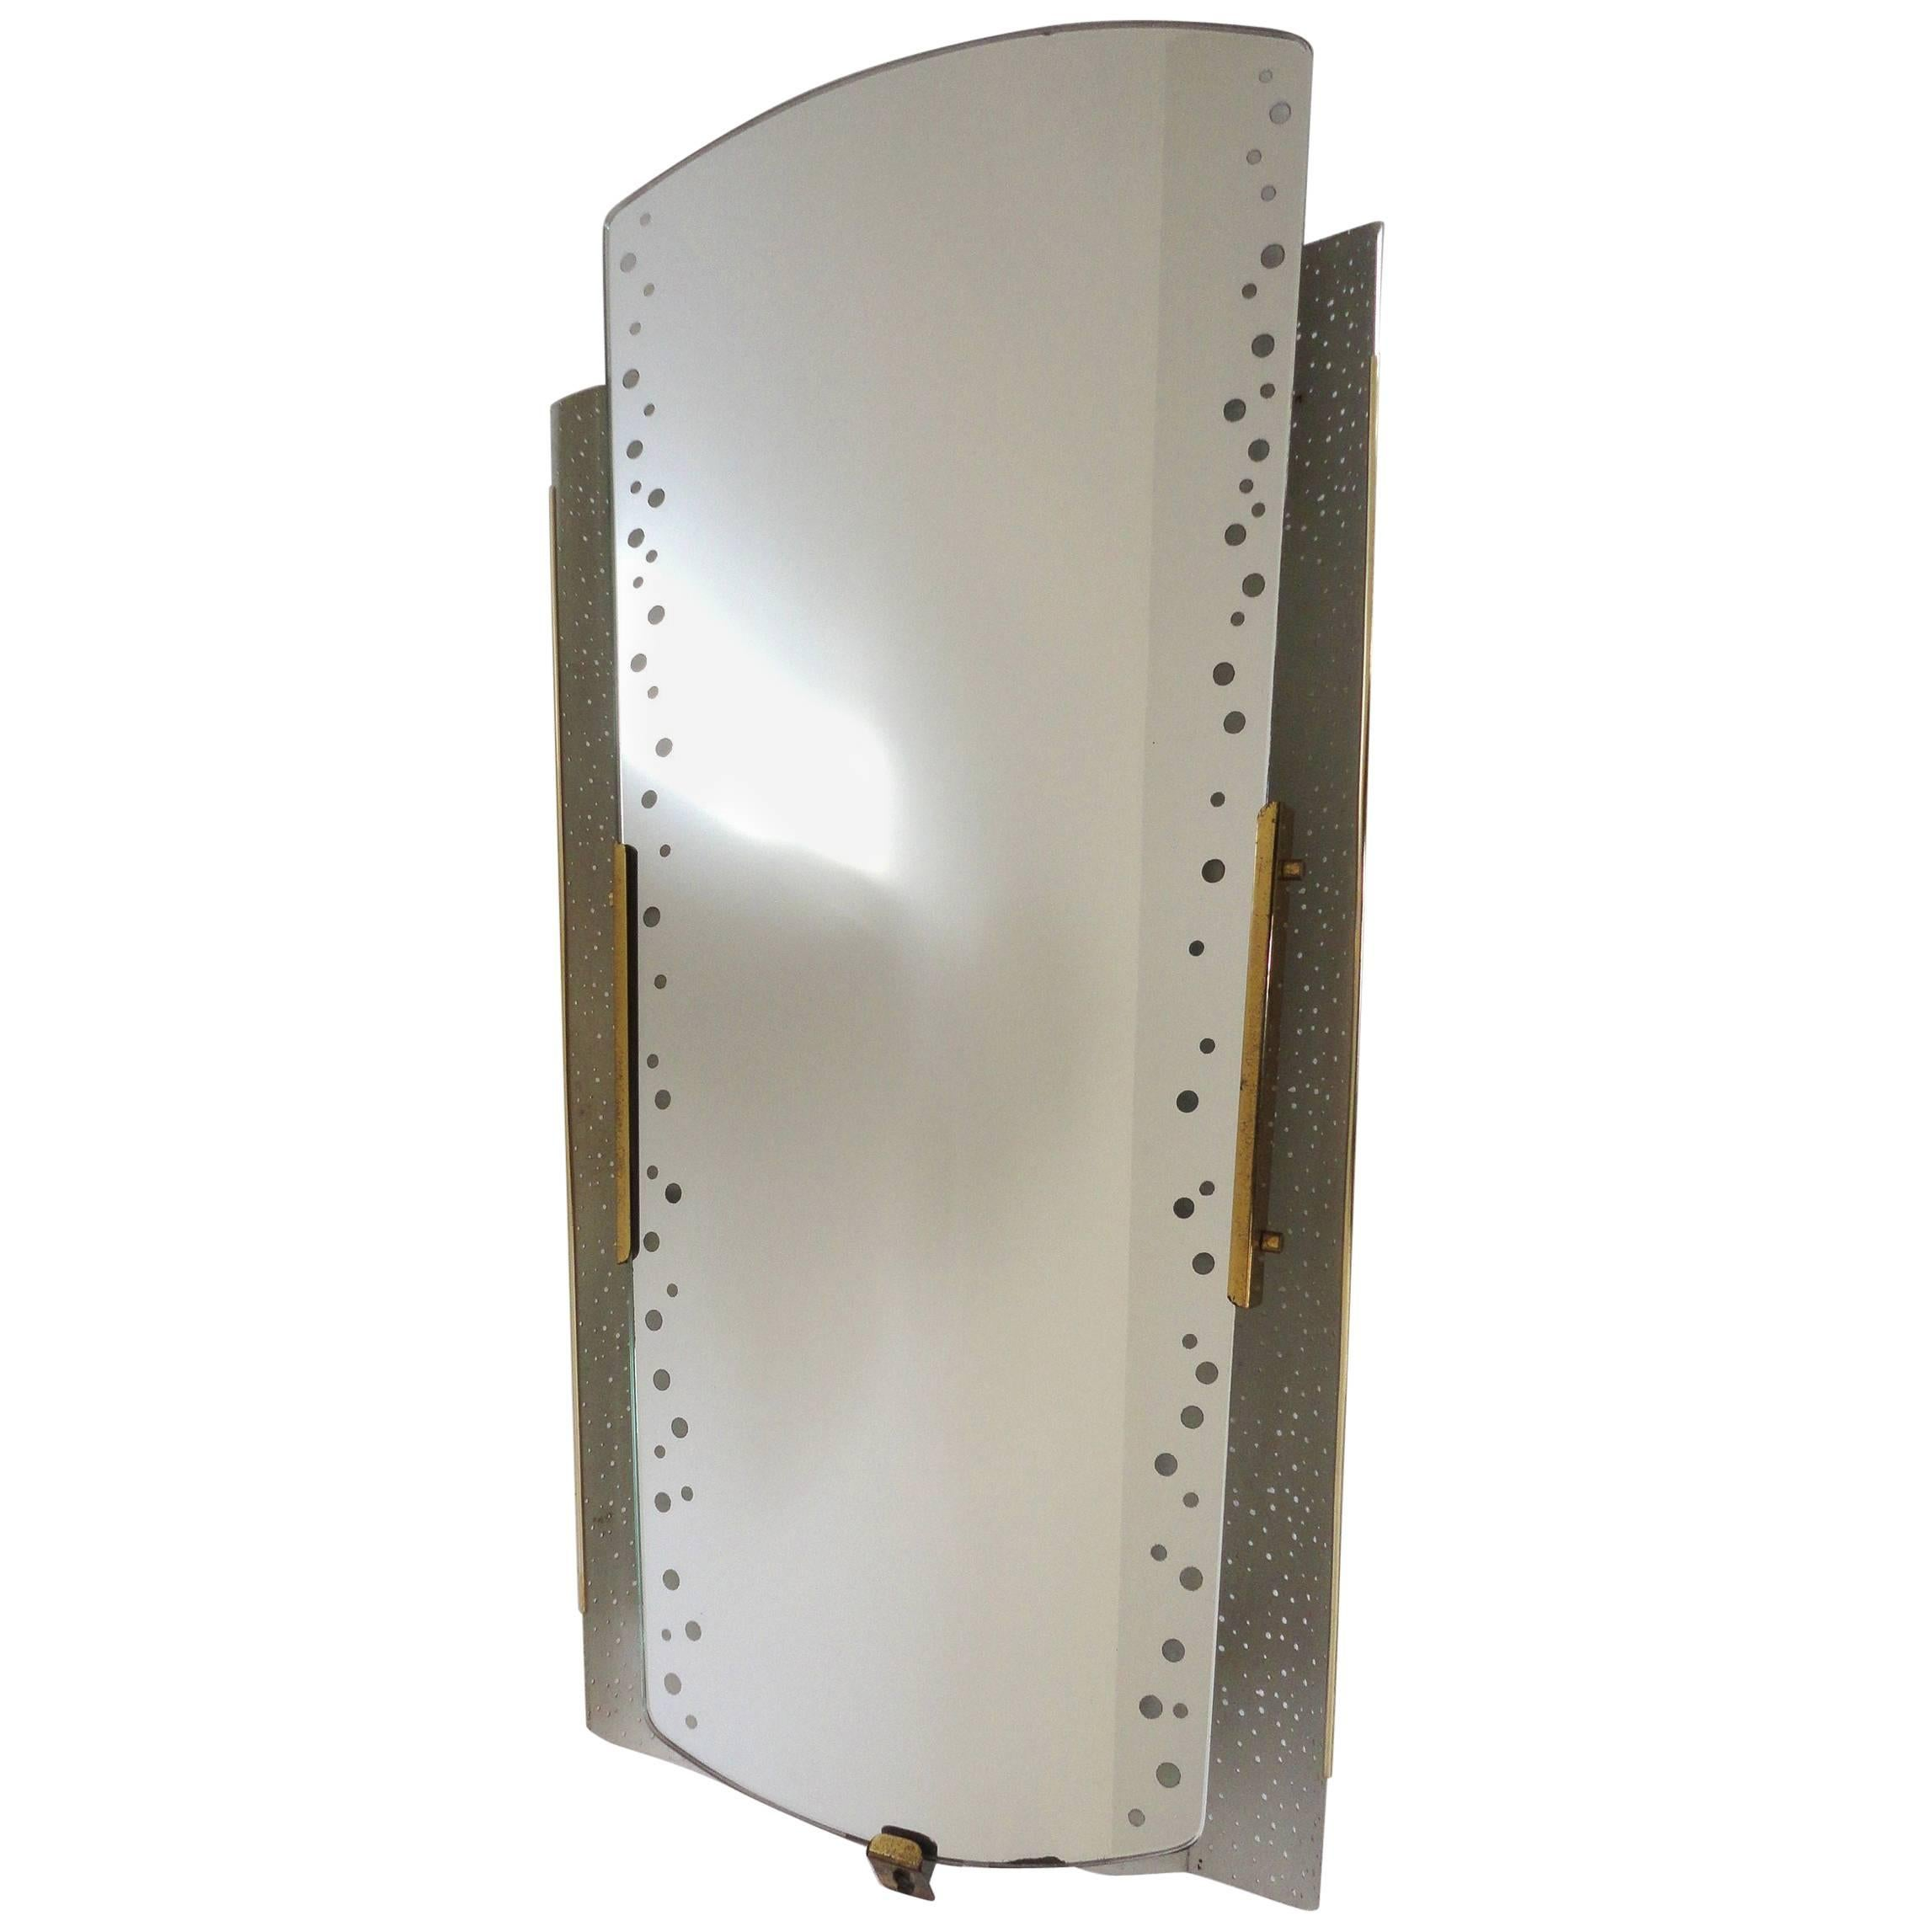 Ernest Igl, Illuminated Back-Lit Mirror, Perforated Metal, Germany, 1950